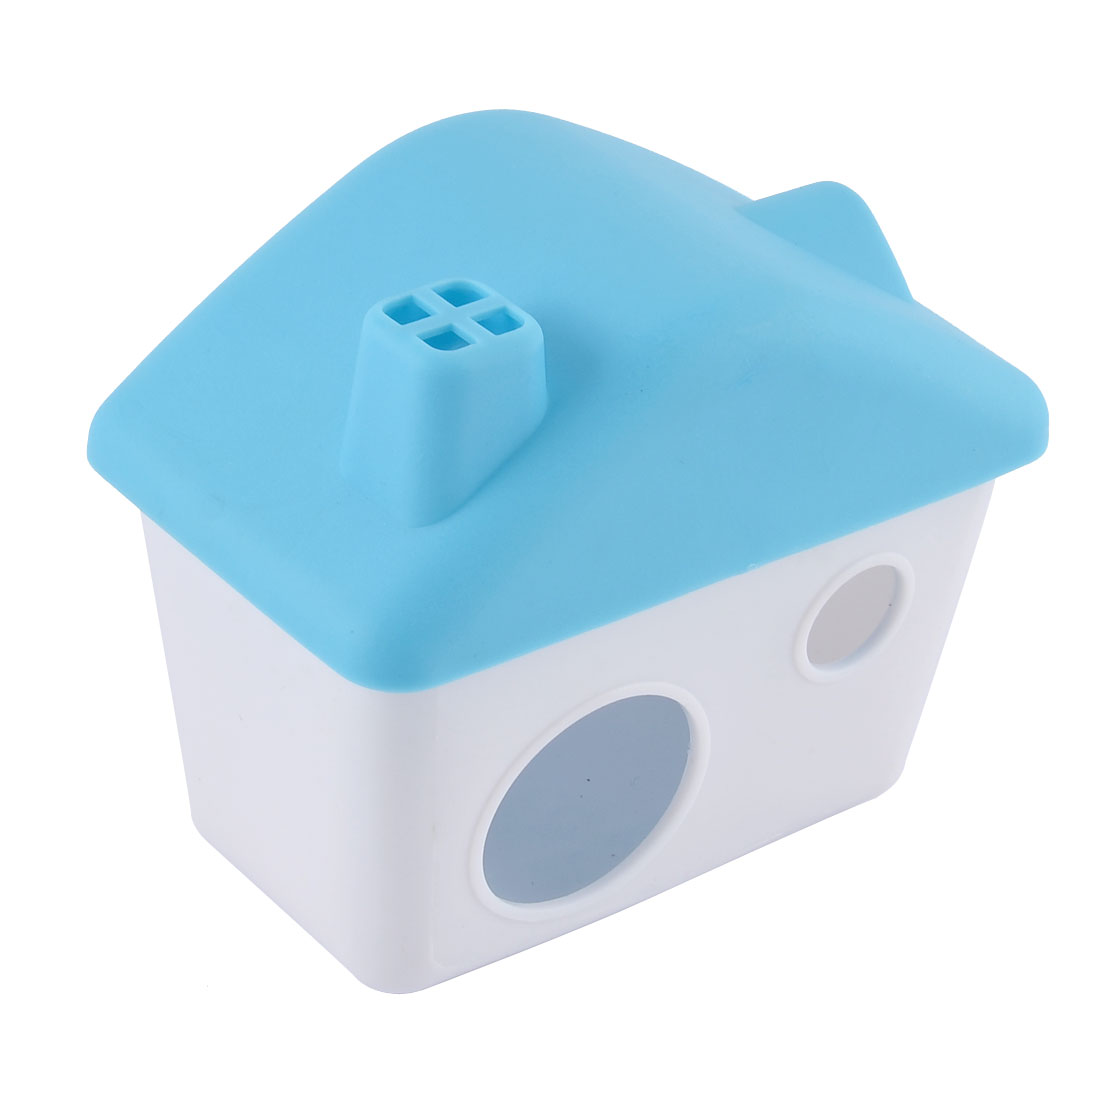 Plastic Cabin Shaped Portable Comfortable Pet Removable Hamster House Blue by Unique-Bargains